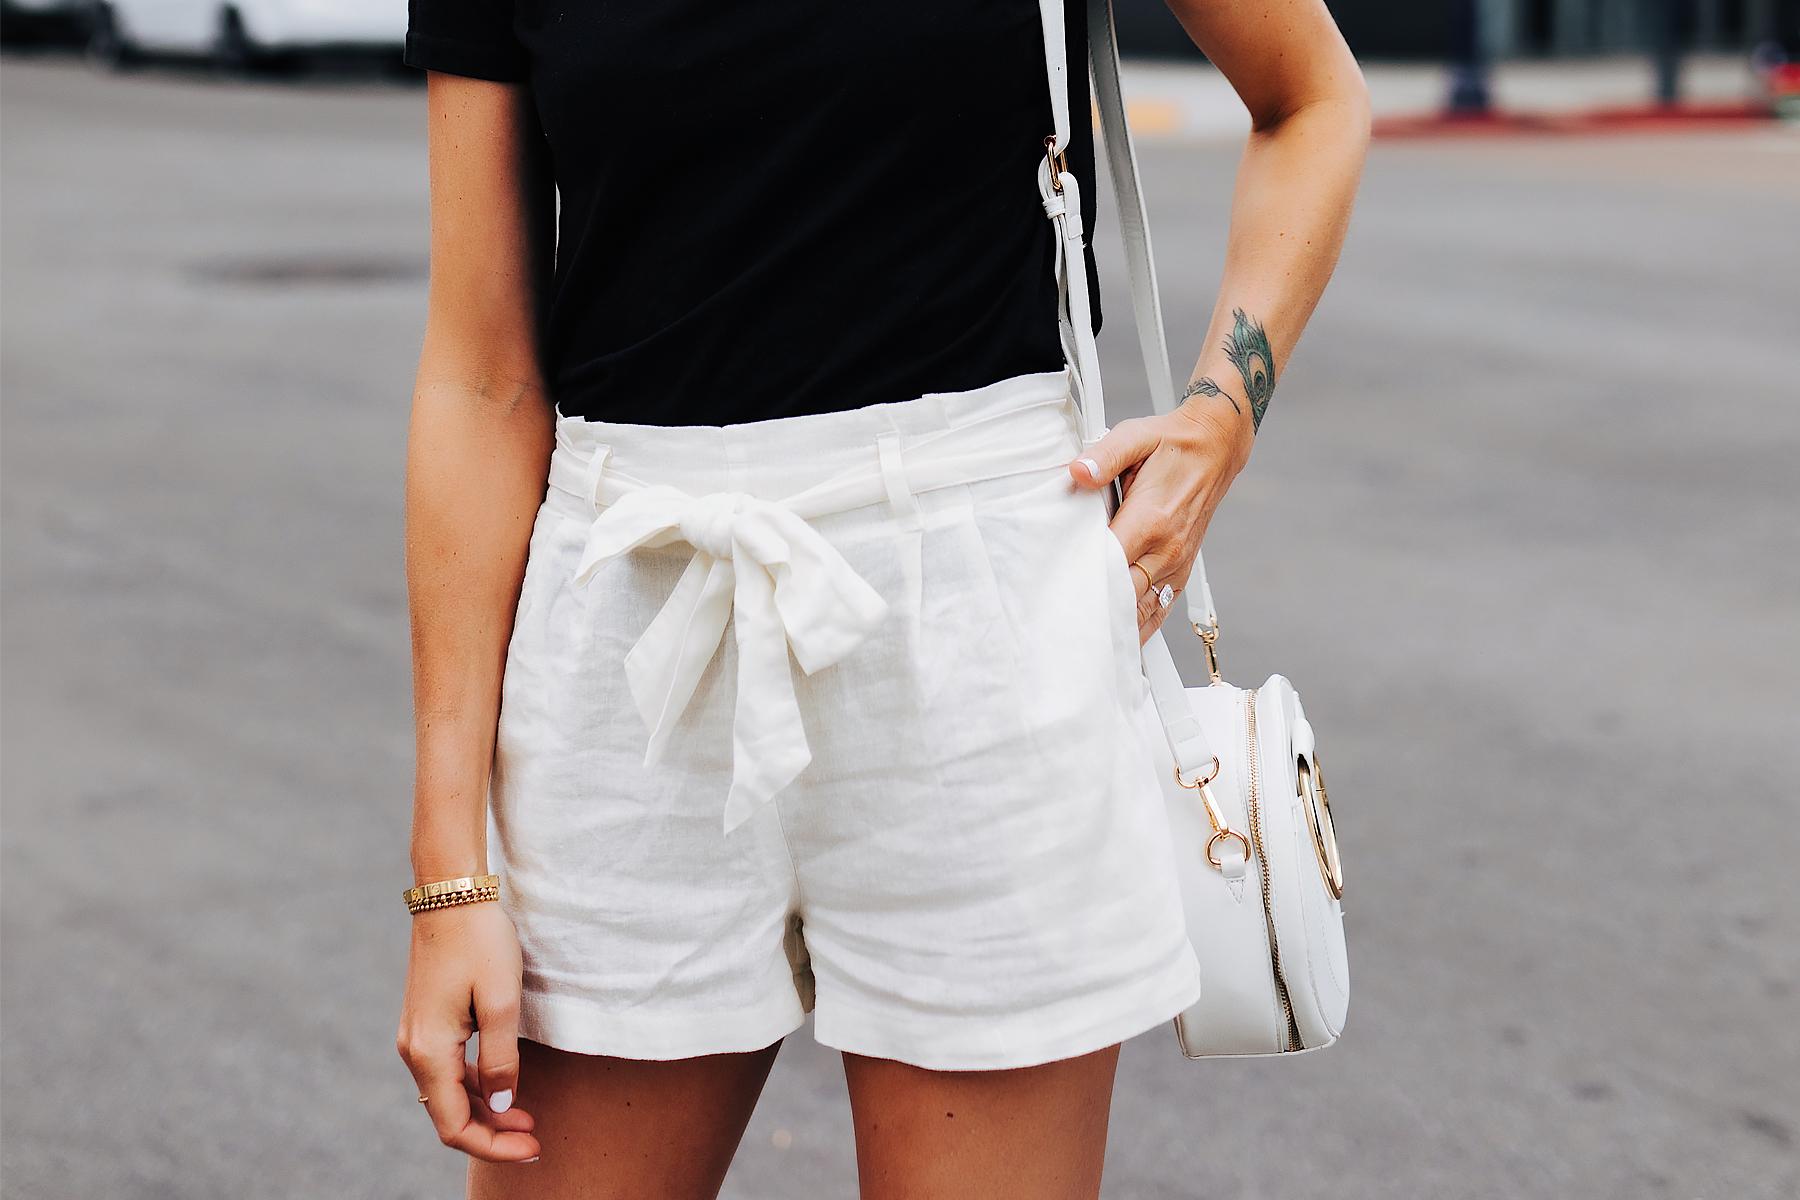 Fashion Jackson Wearing White Tie Front Shorts Black Tshirt White Circle Handbag